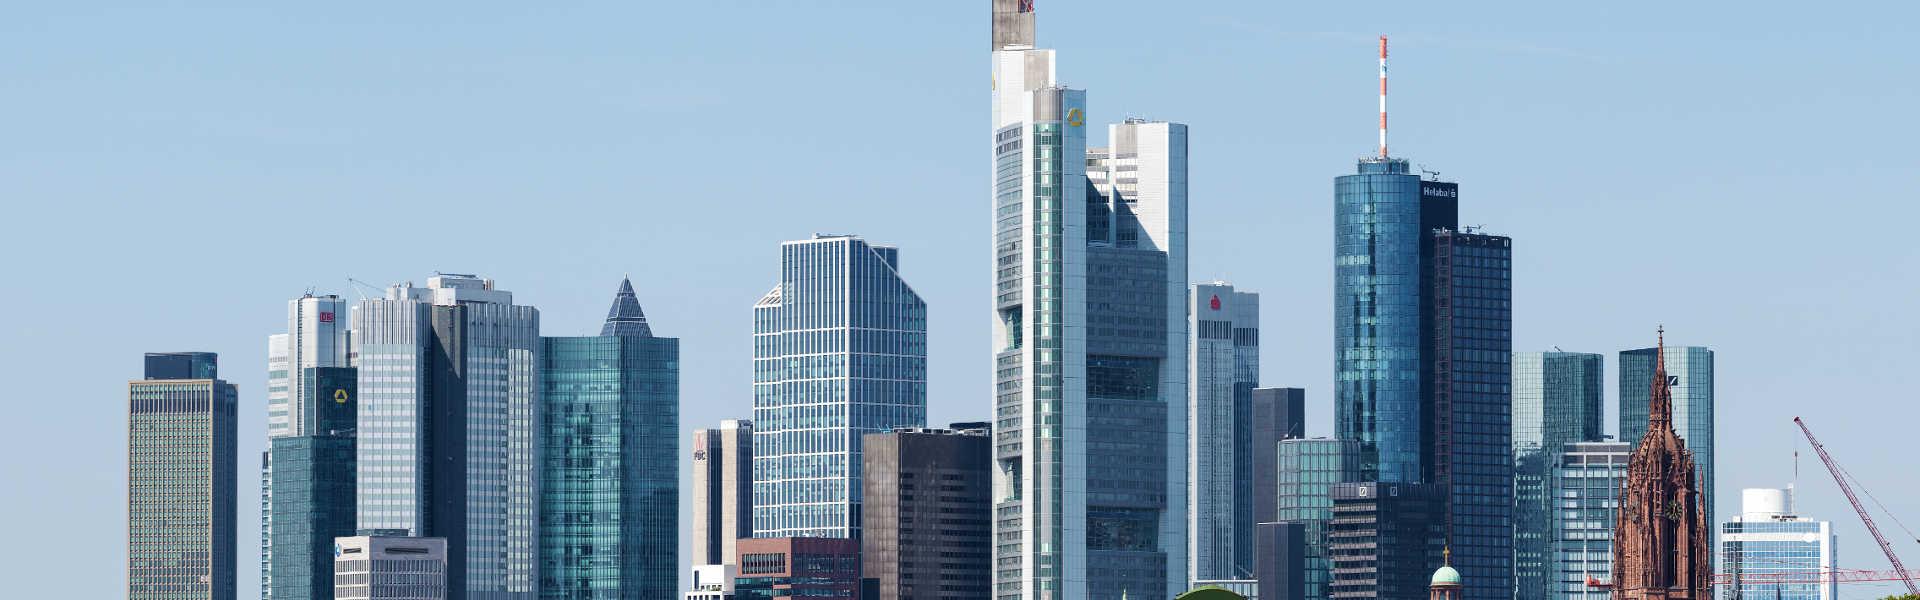 Standleitung Frankfurt